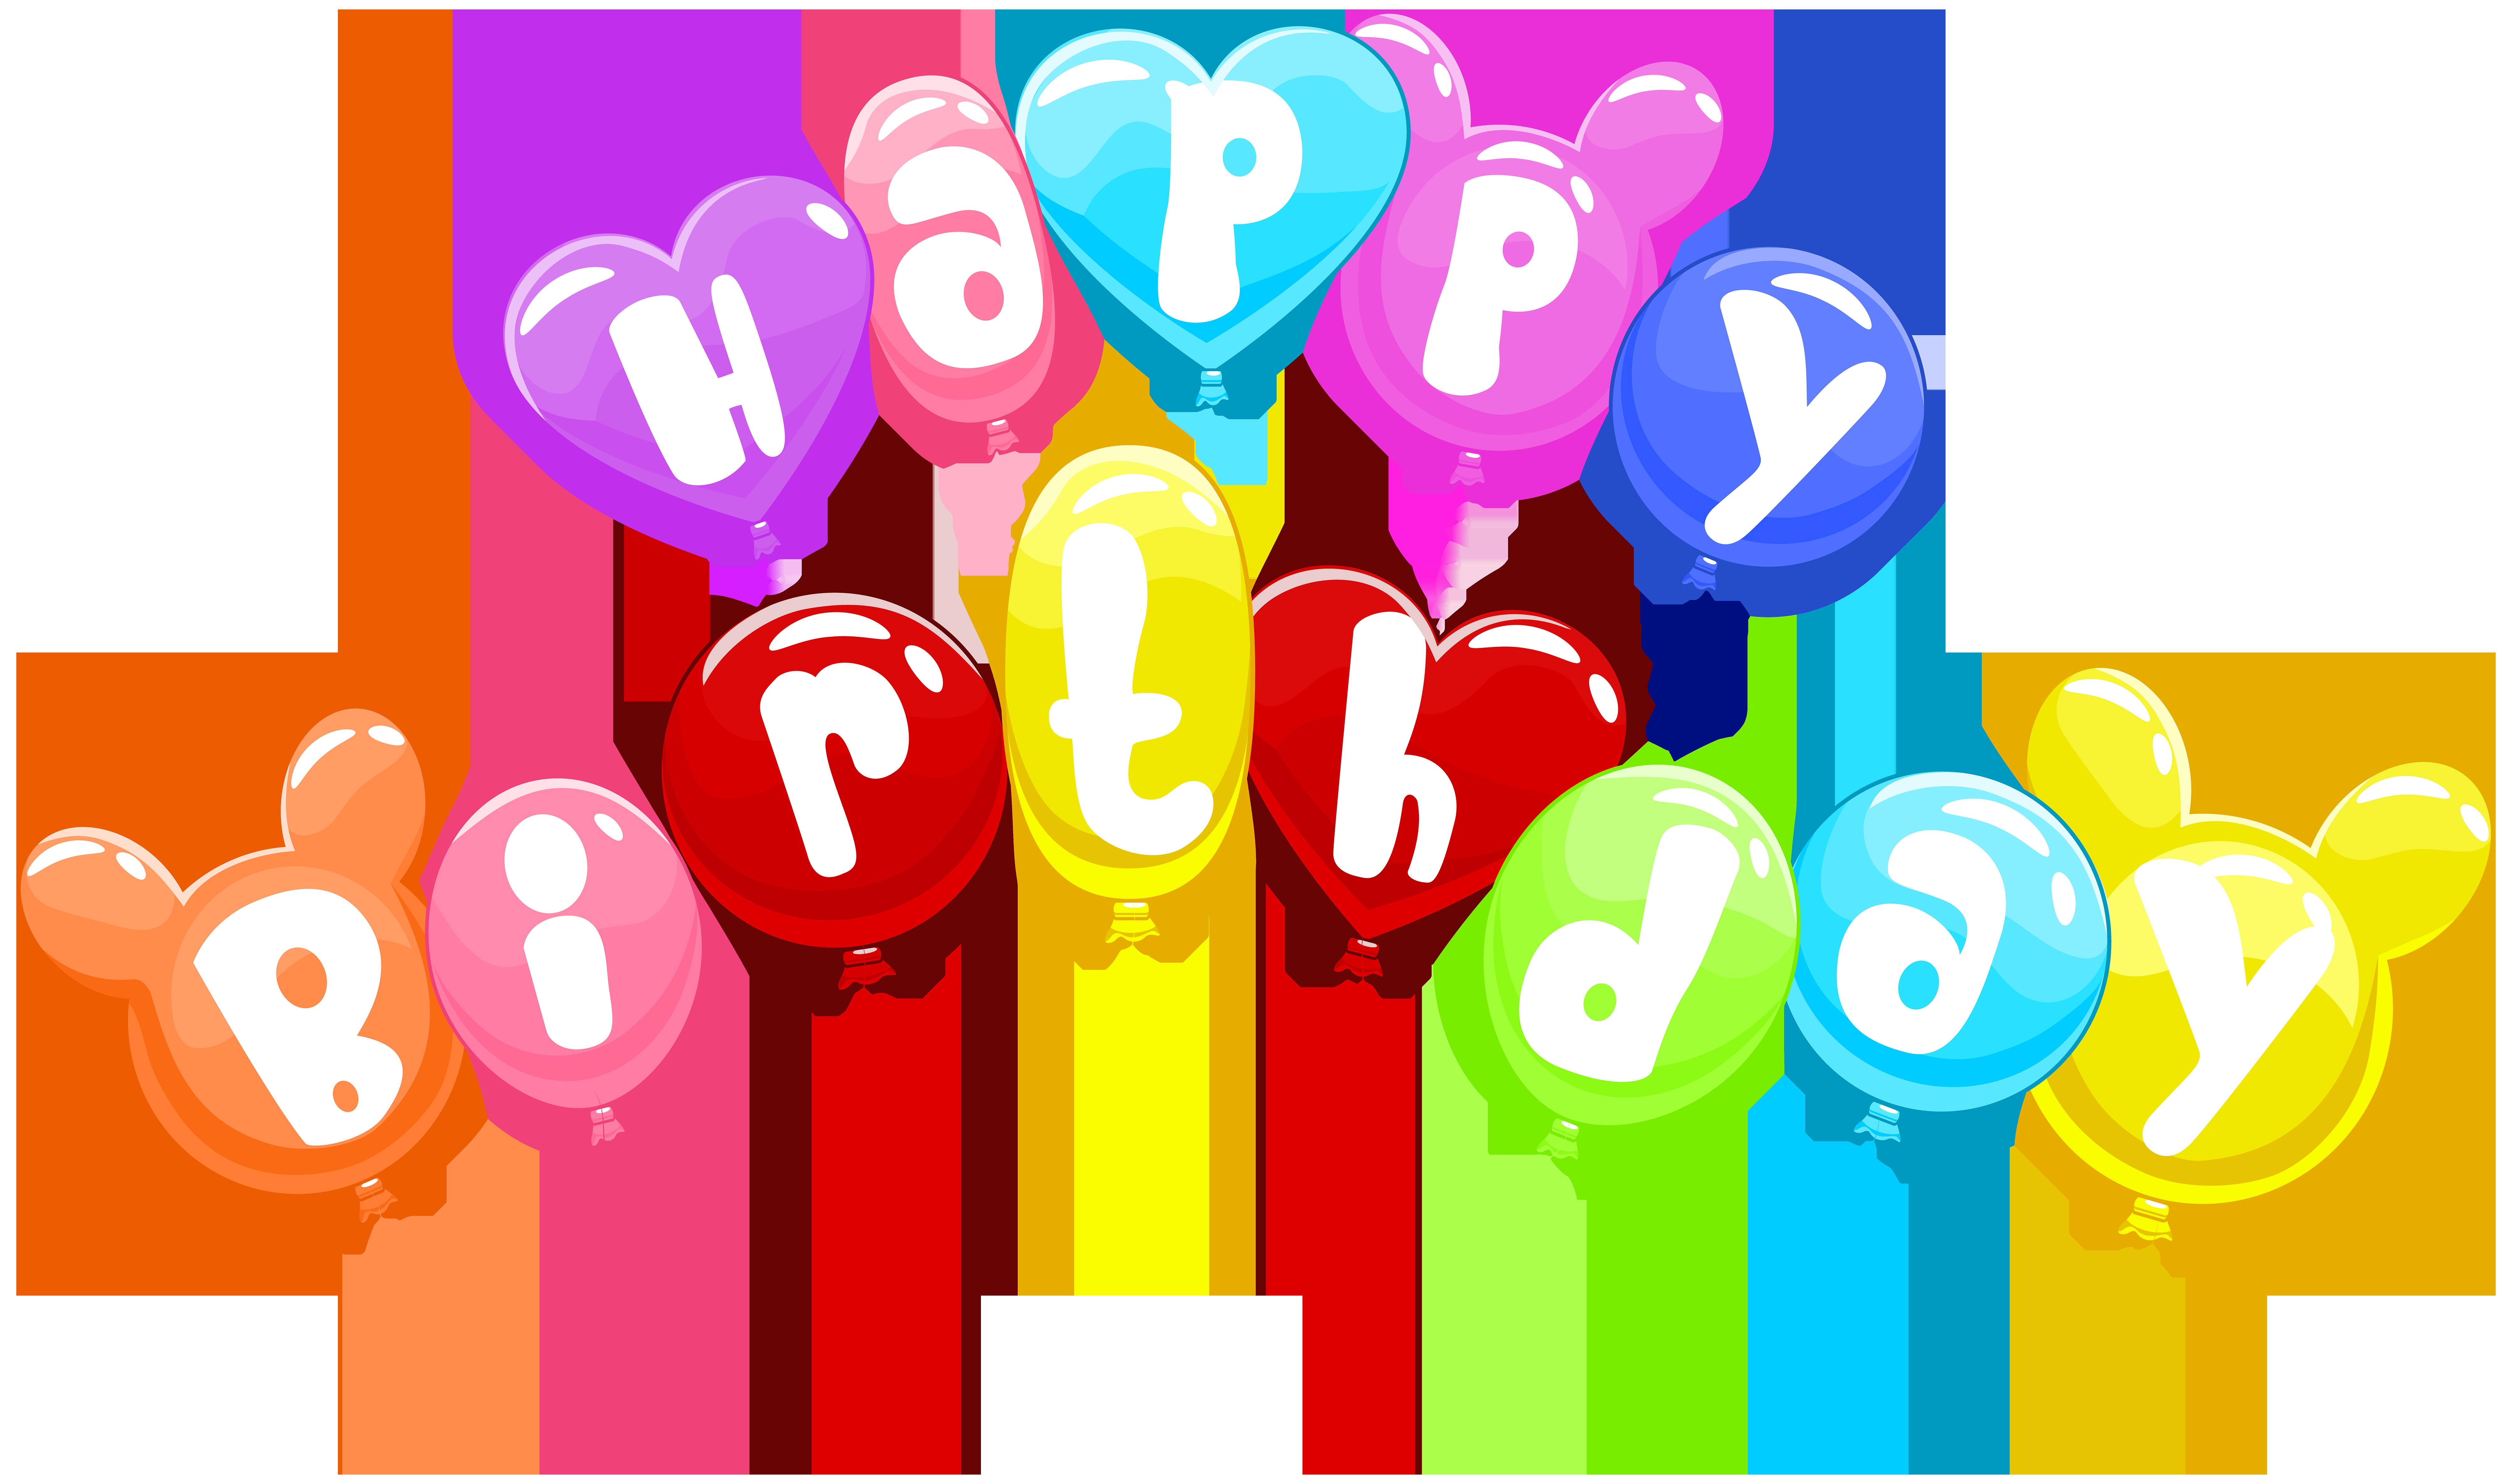 clipart library download Vector balloon happy birthday. Ballon clipart pretty frames